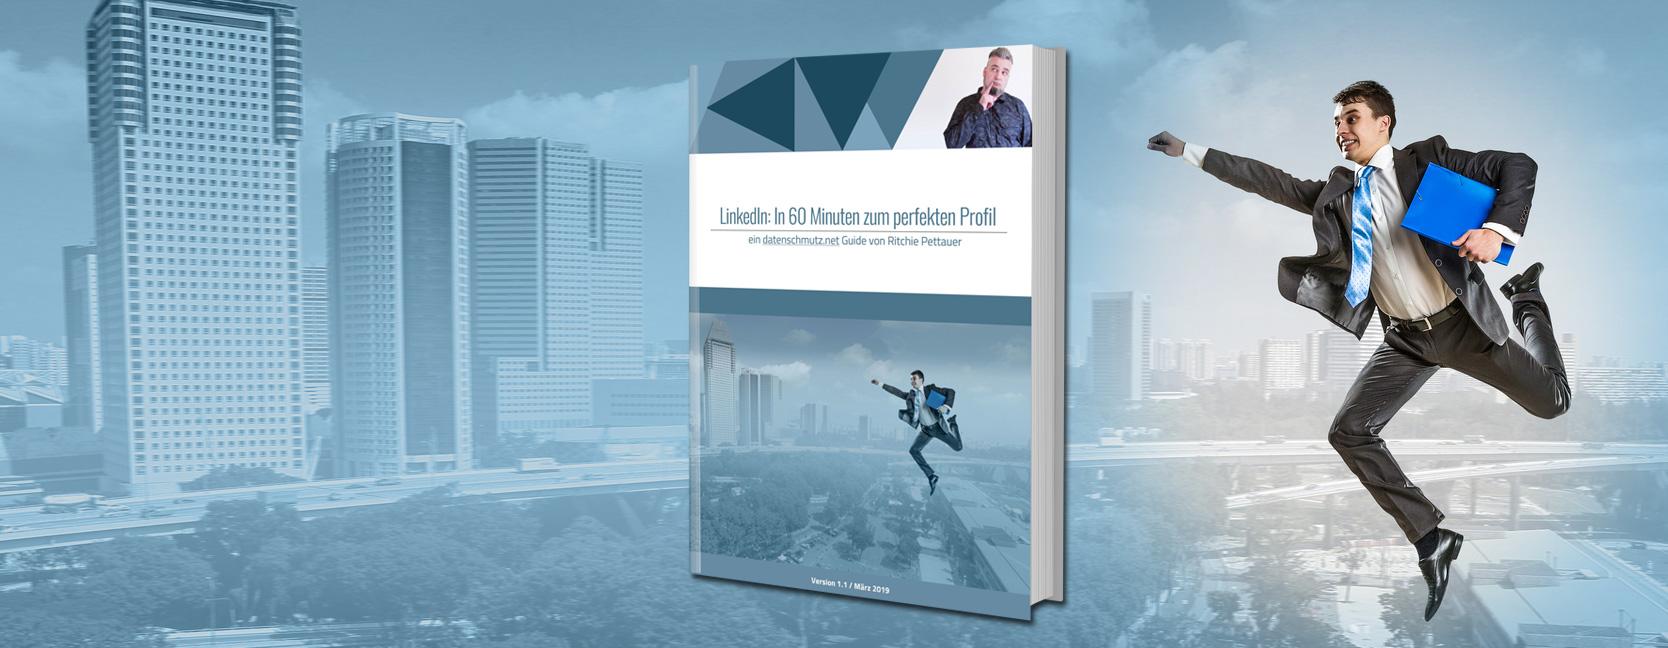 LinkedIn Profil Guide - kostenloses eBook